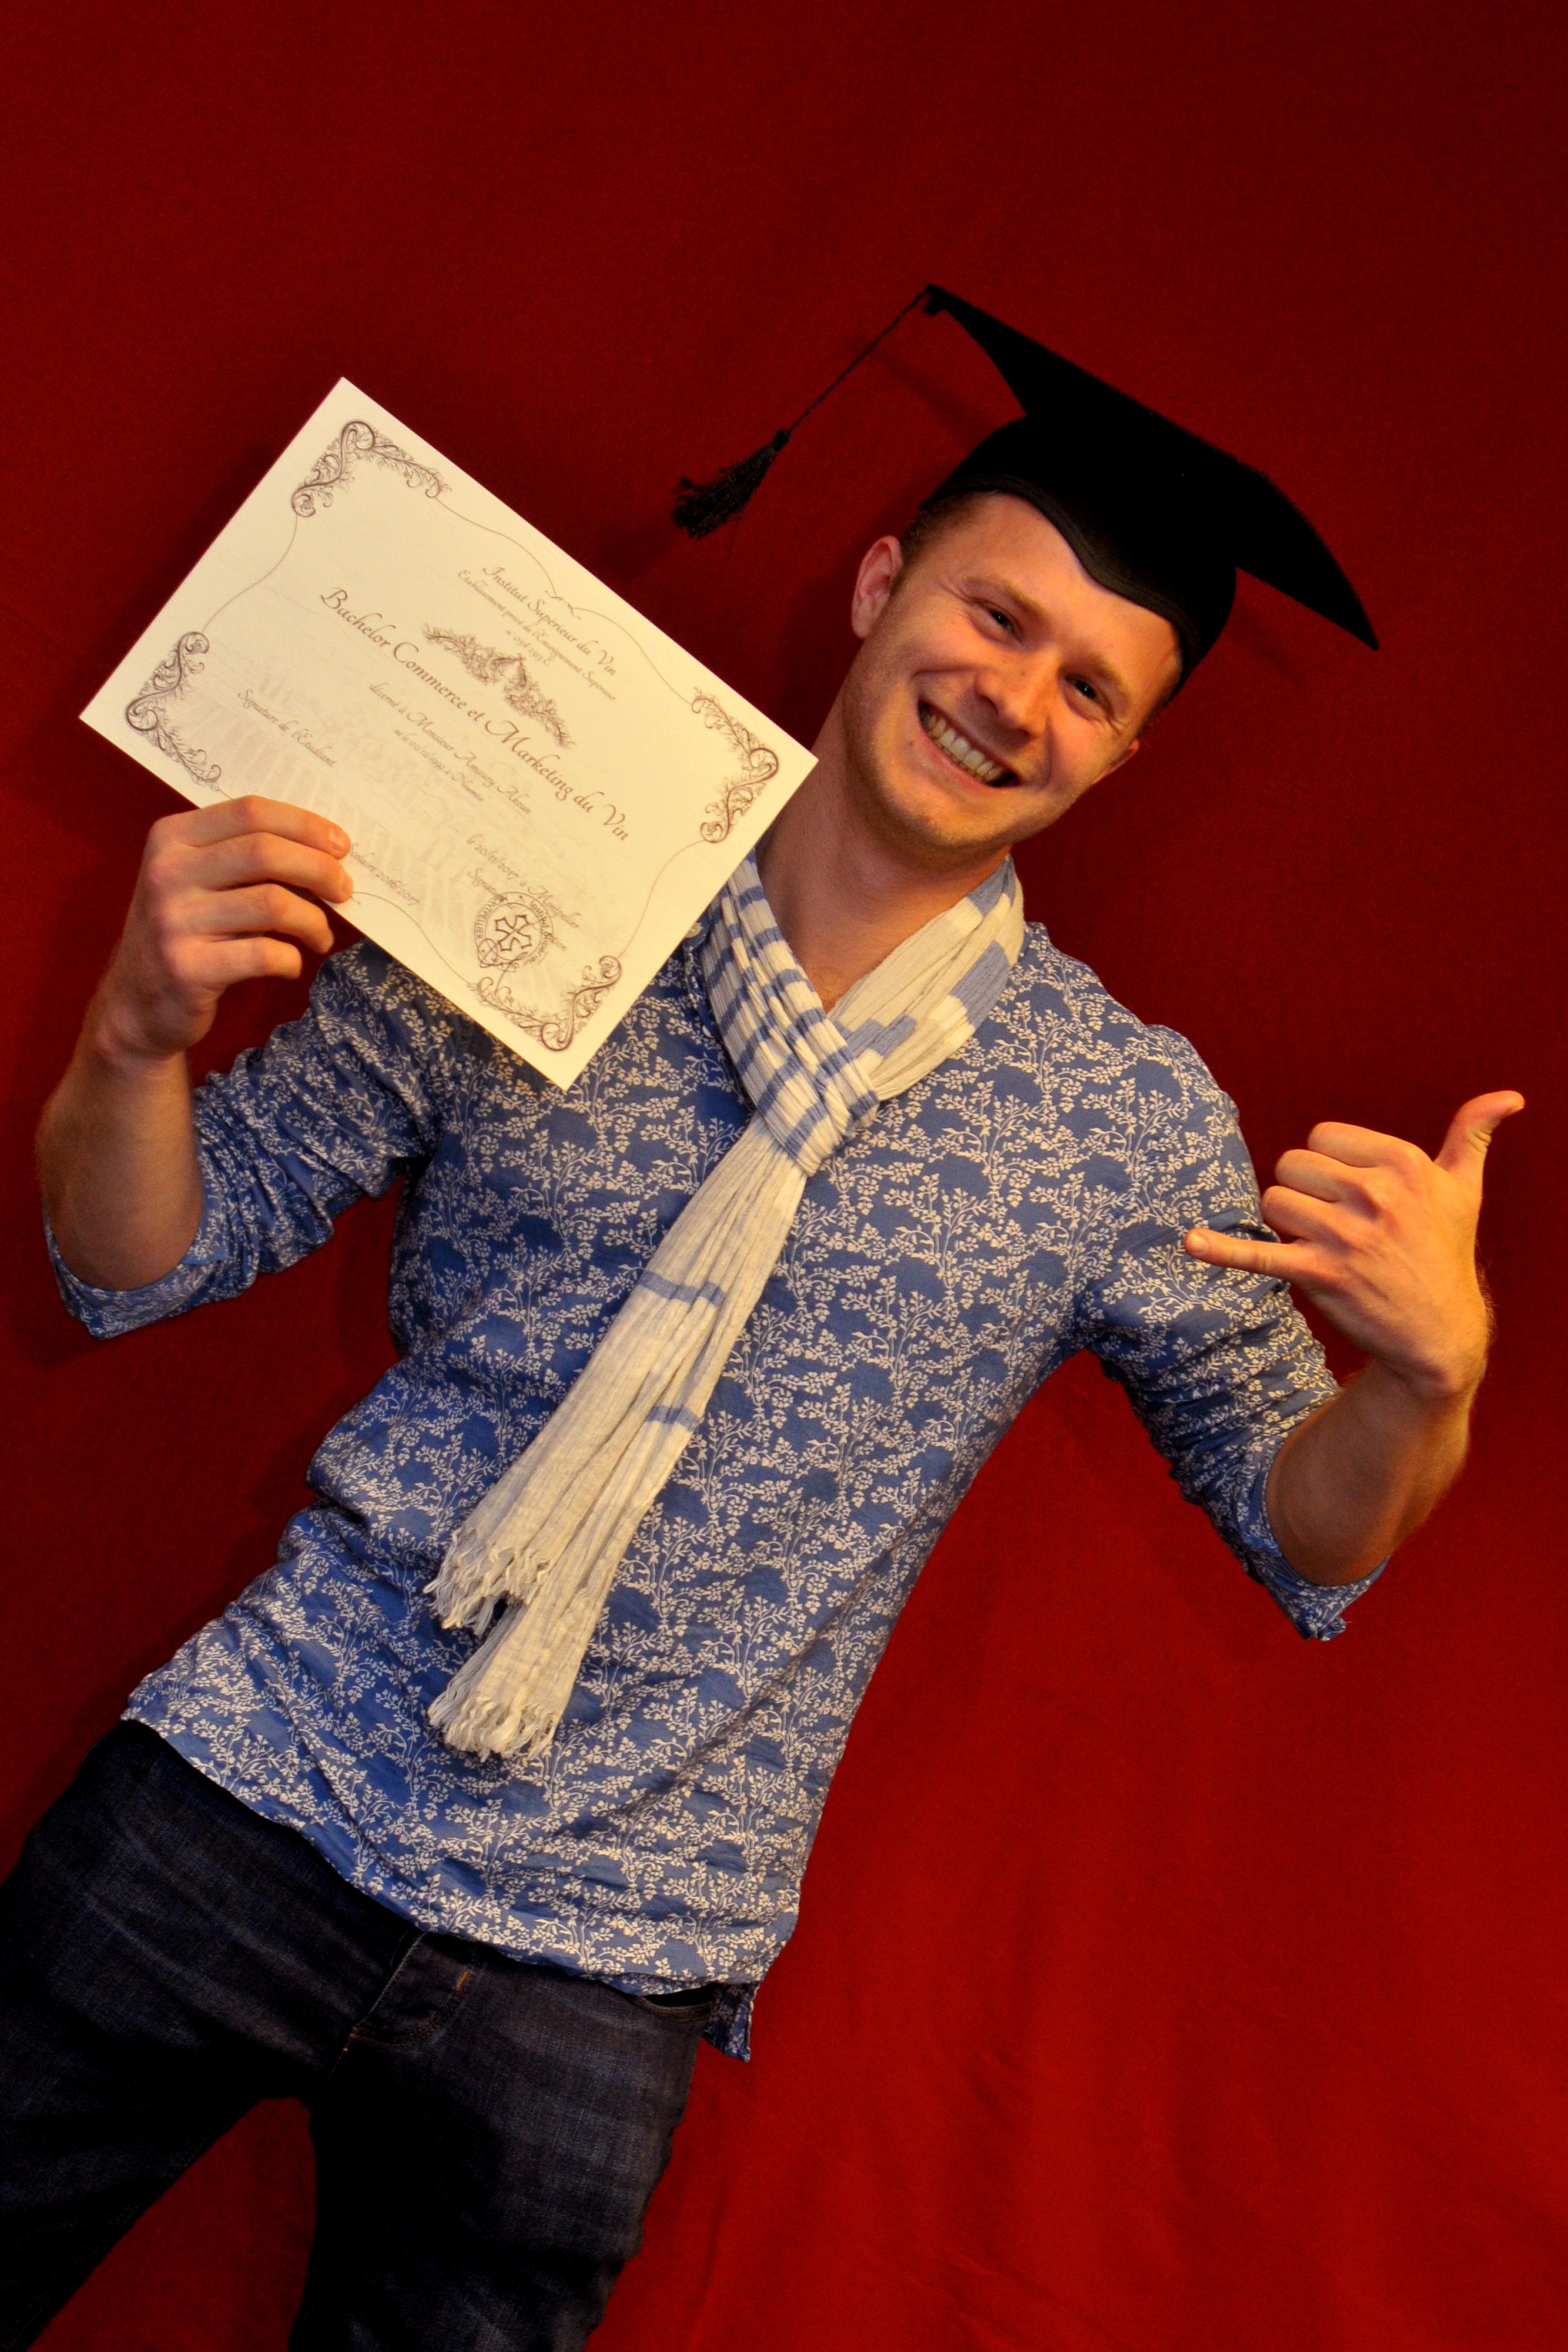 Remise des diplomes084